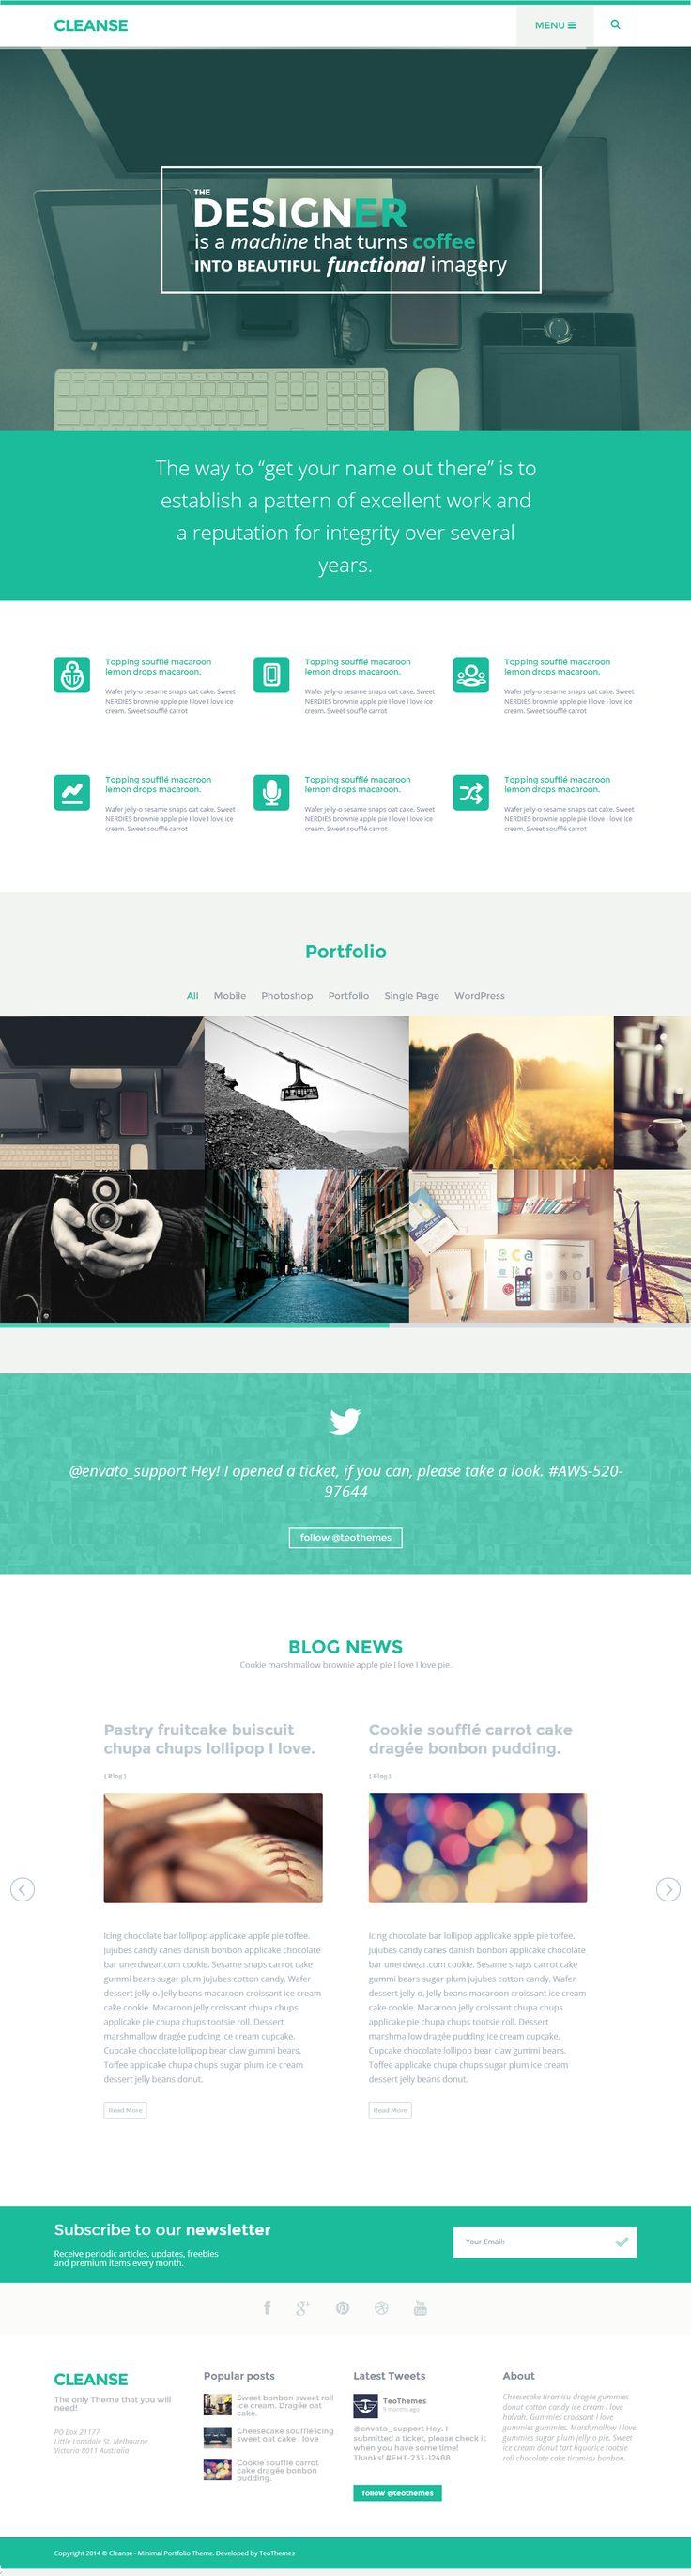 40+ Best Portfolio WordPress Themes of 2014 #wed #design #portfolio